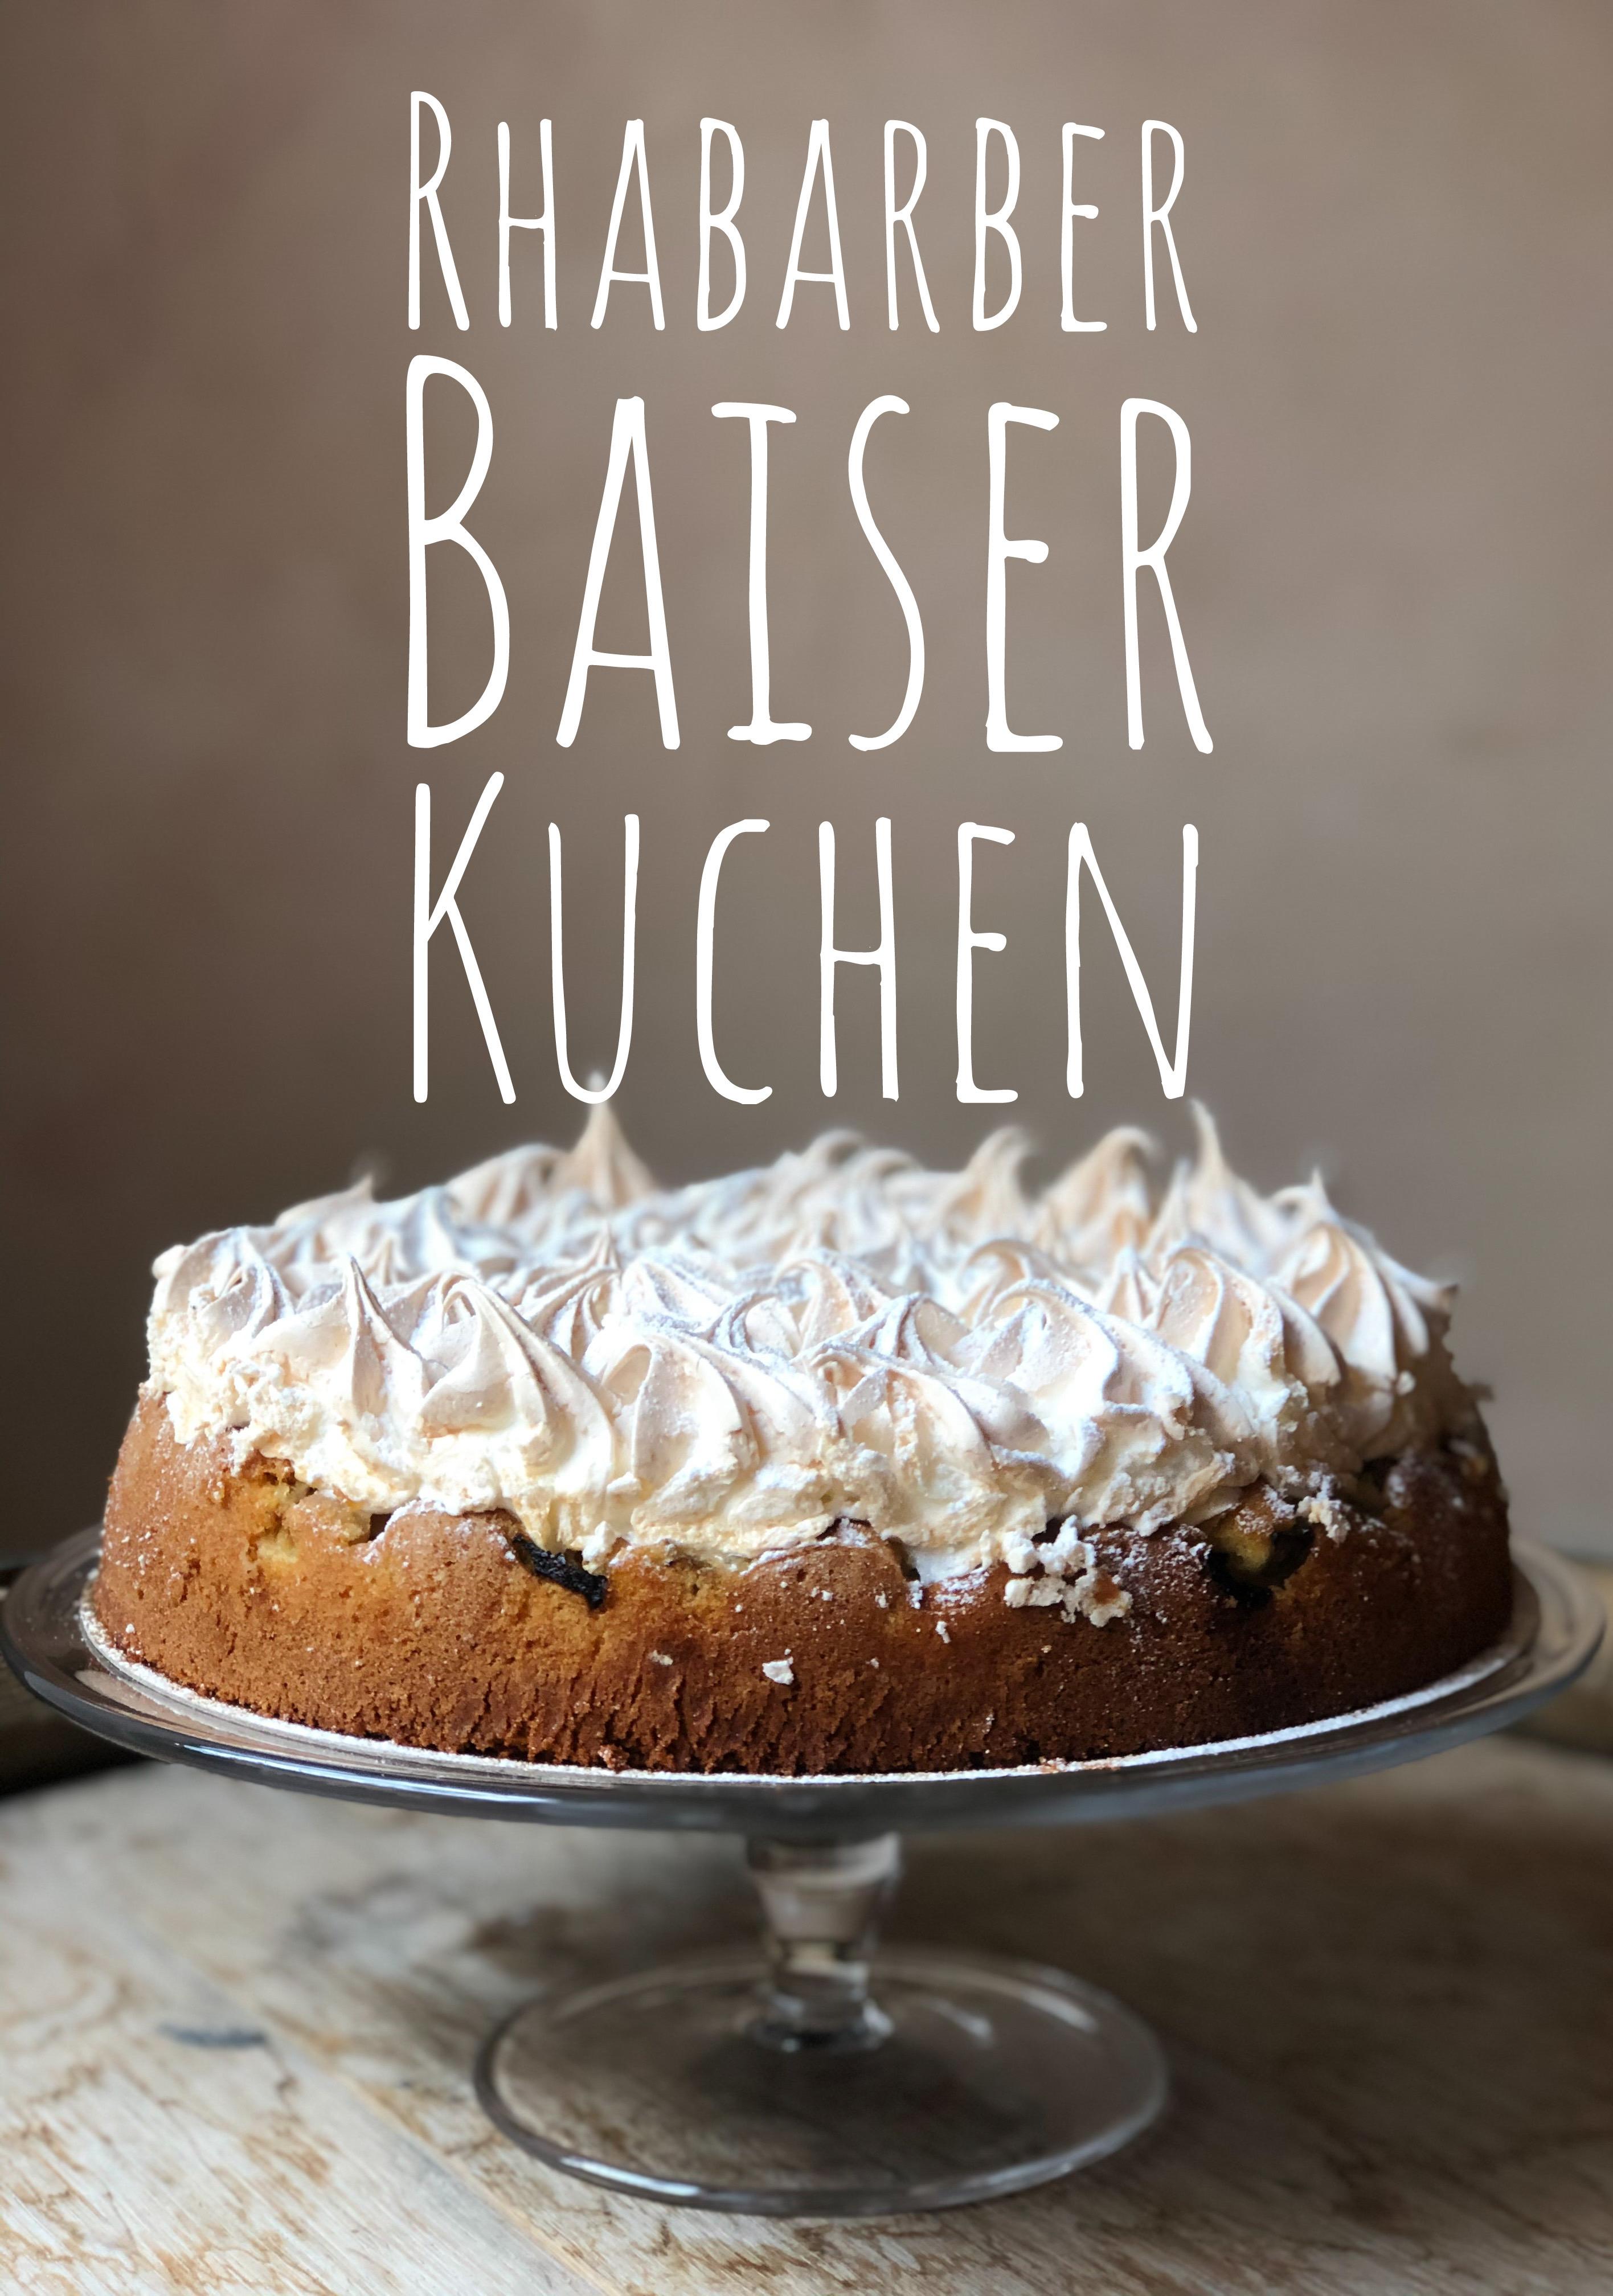 19. Rhabarber Baiser Kuchen